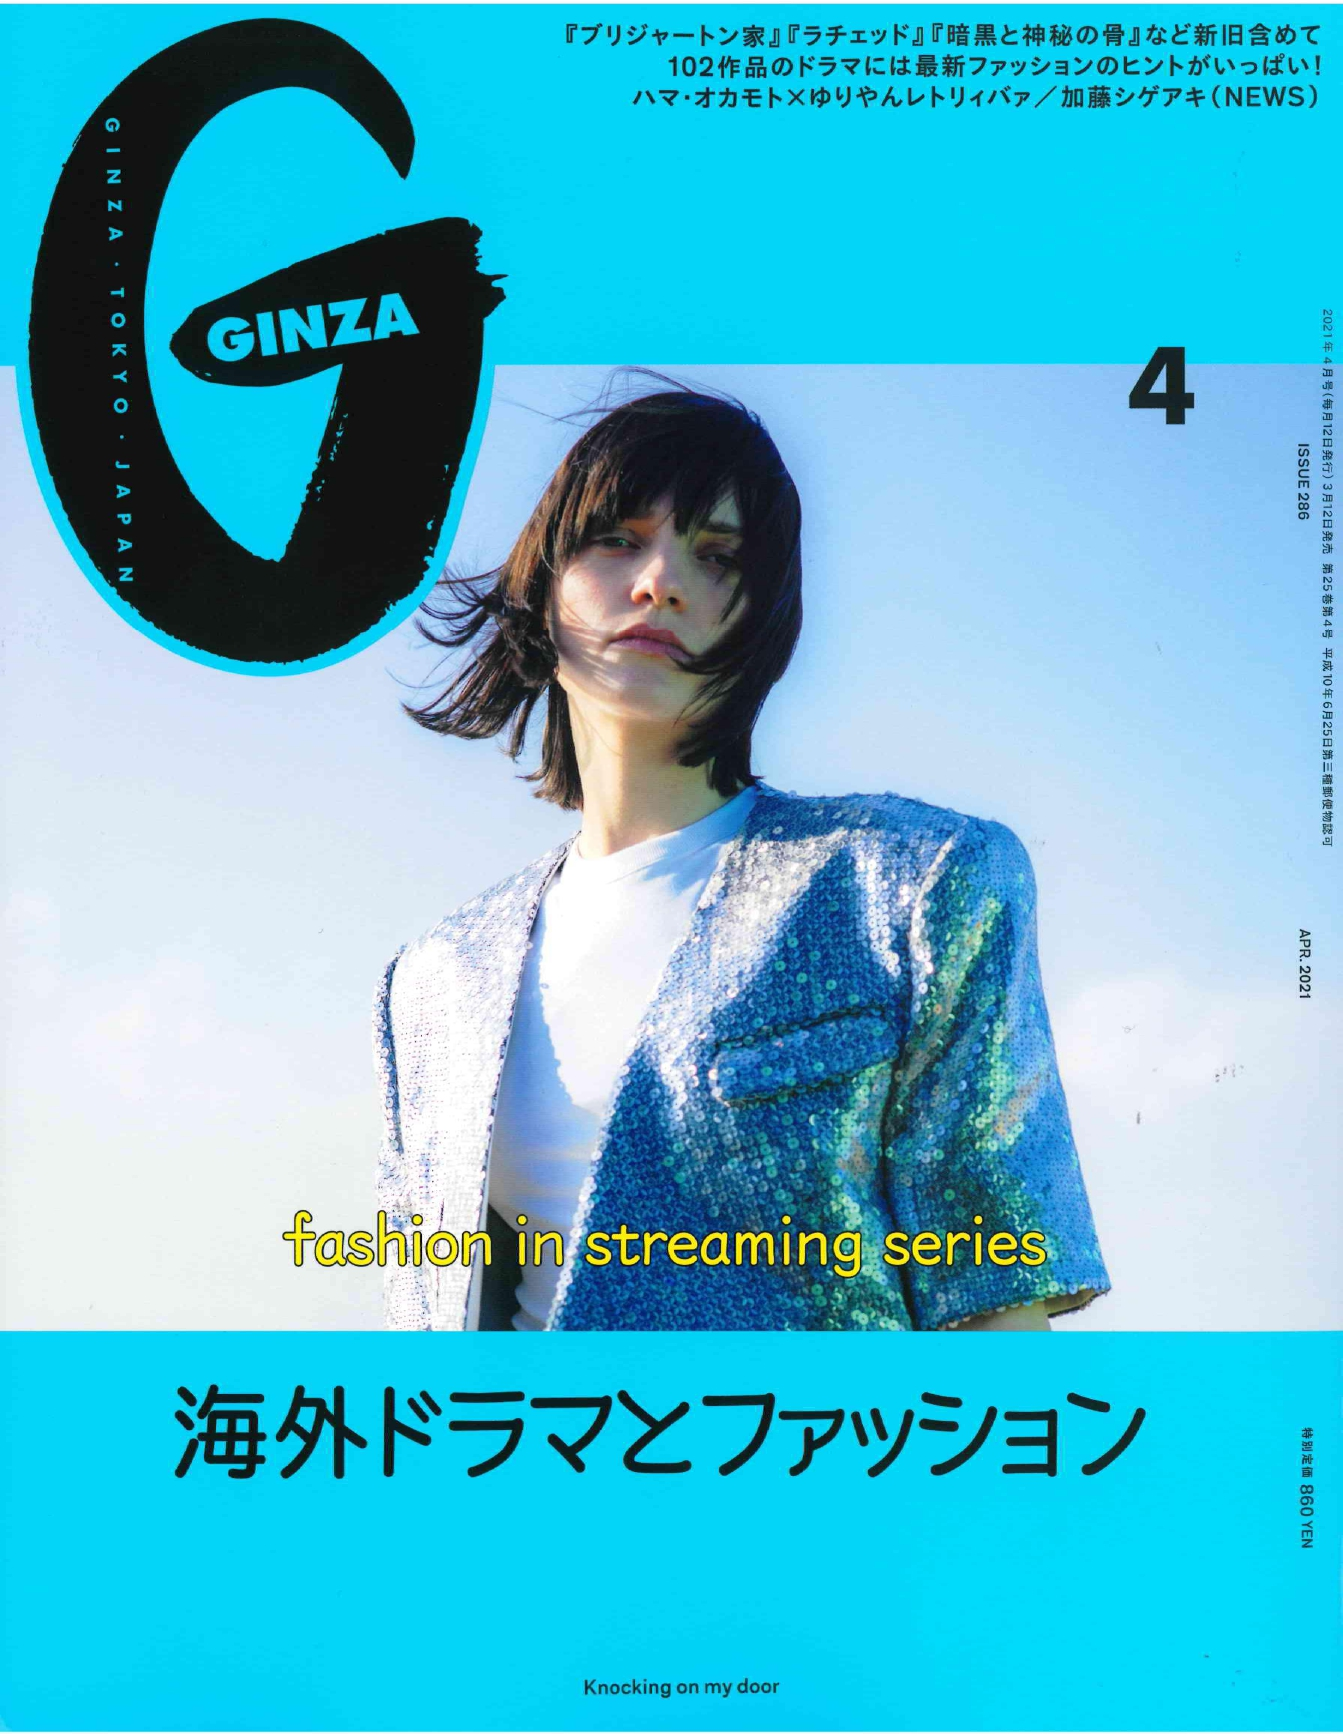 【掲載情報】GINZA 4月号 / HOUYHNHNM Unplugged